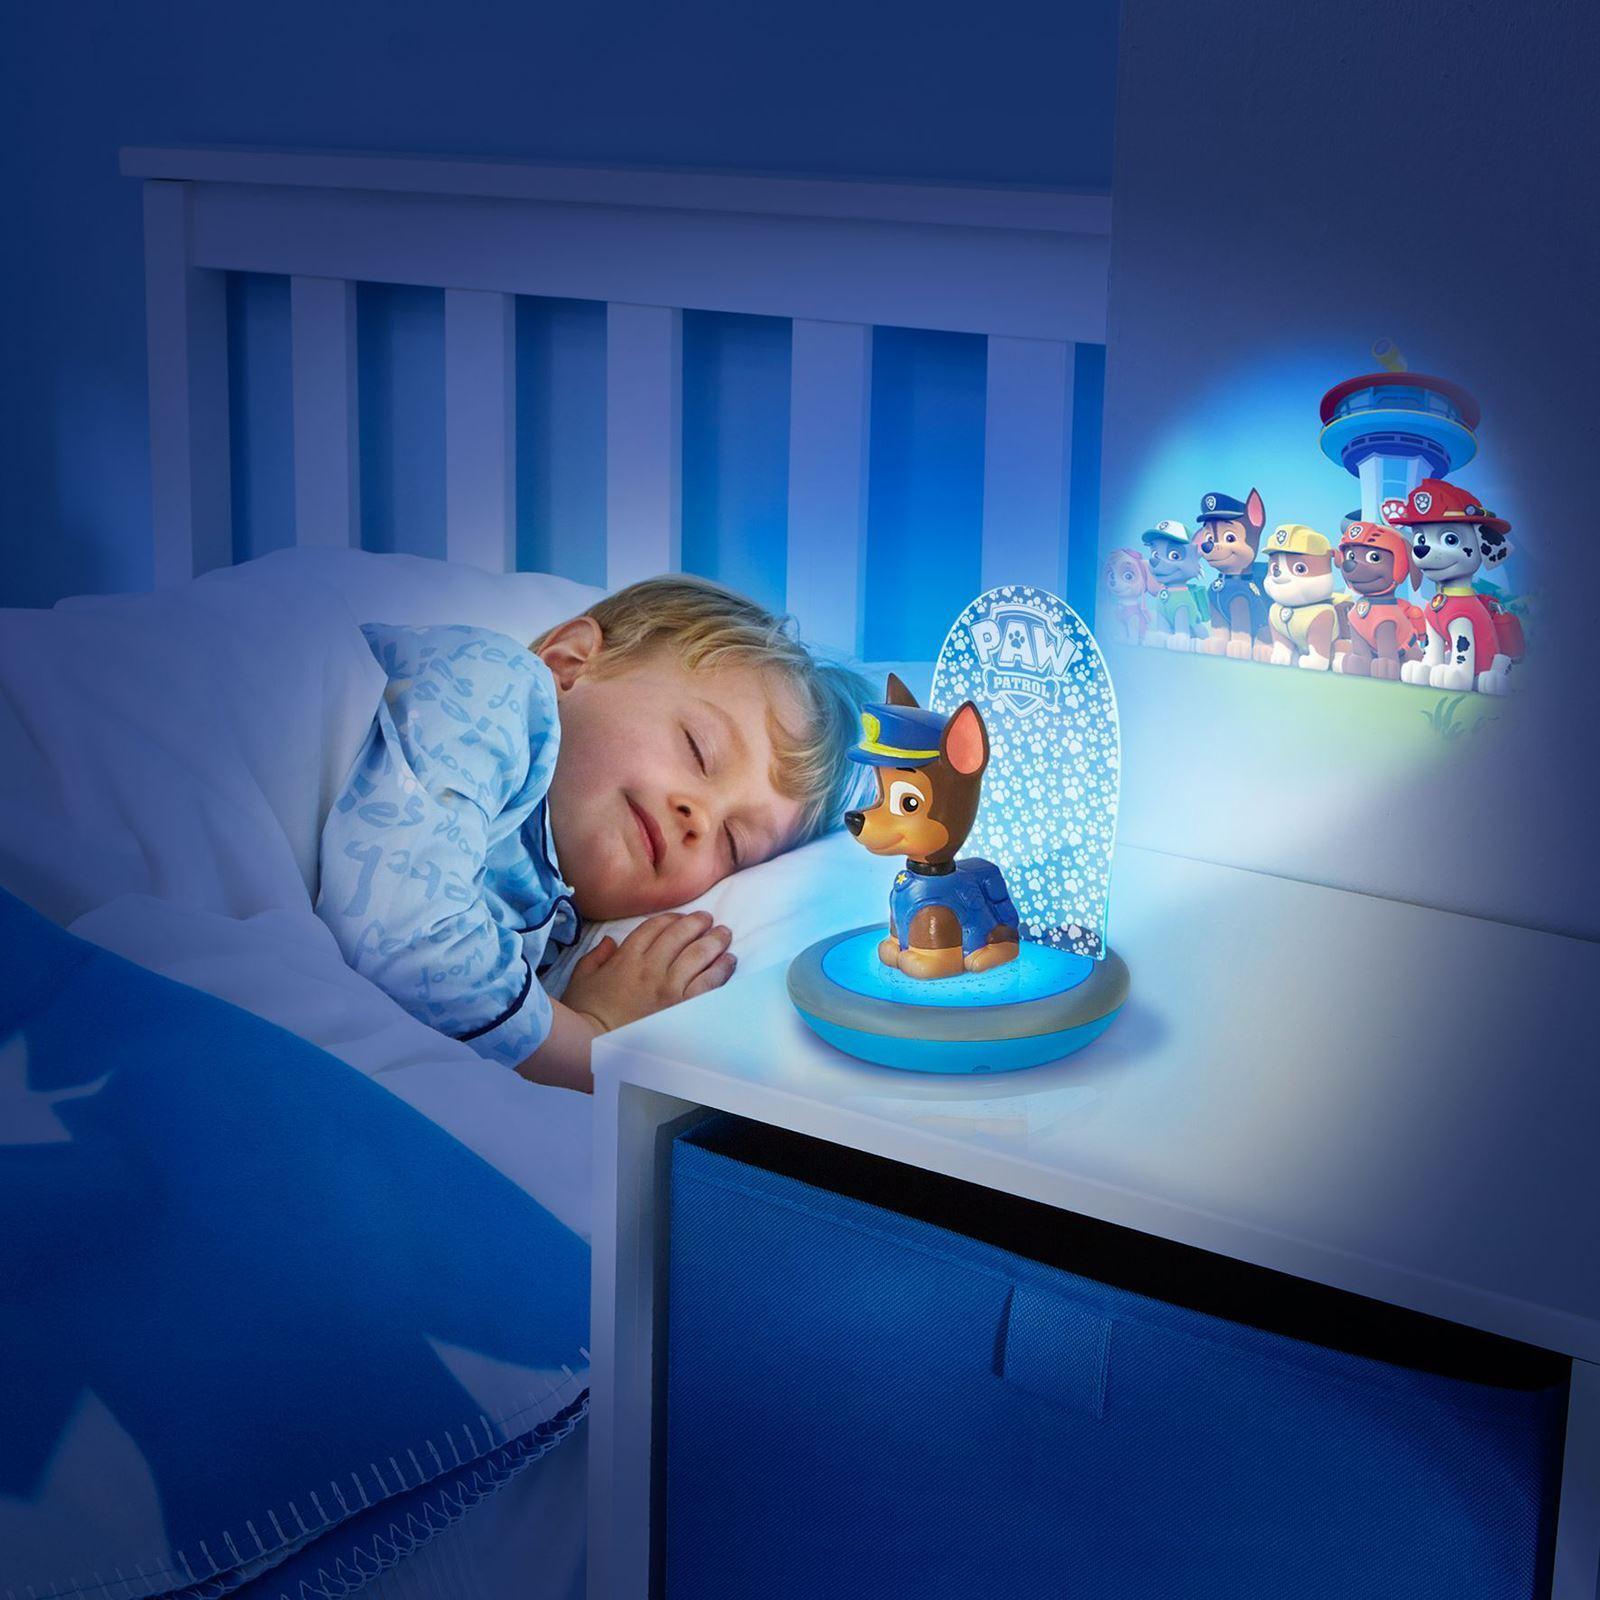 Paw Patrol Chase 3 In 1 Magic Go Glow Night Light Kids